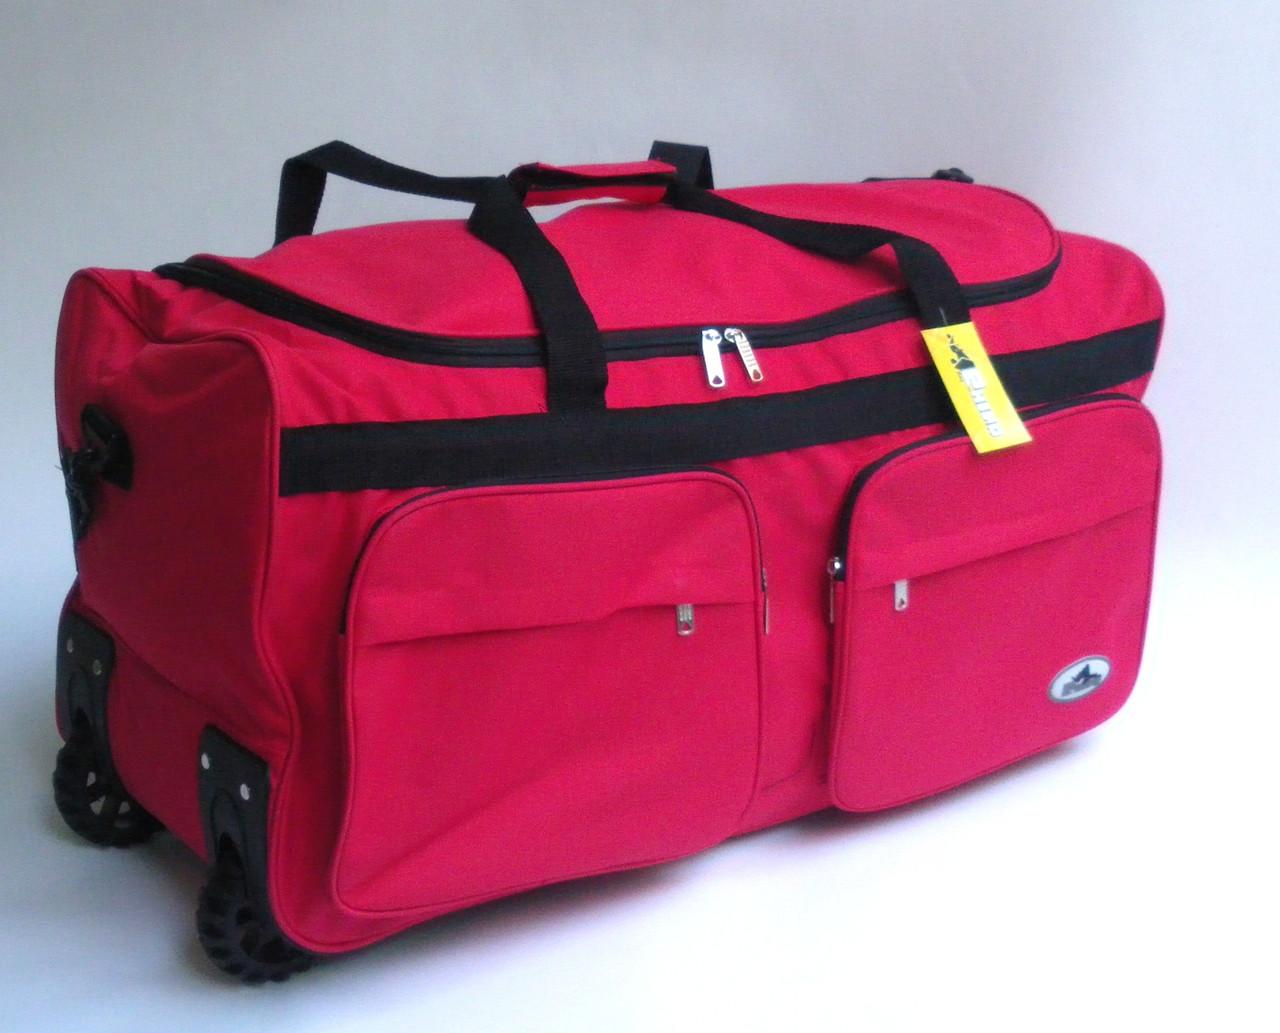 a483f733198e Дорожная - спортивная сумка на колесах Rhino - красная, 46 л ...